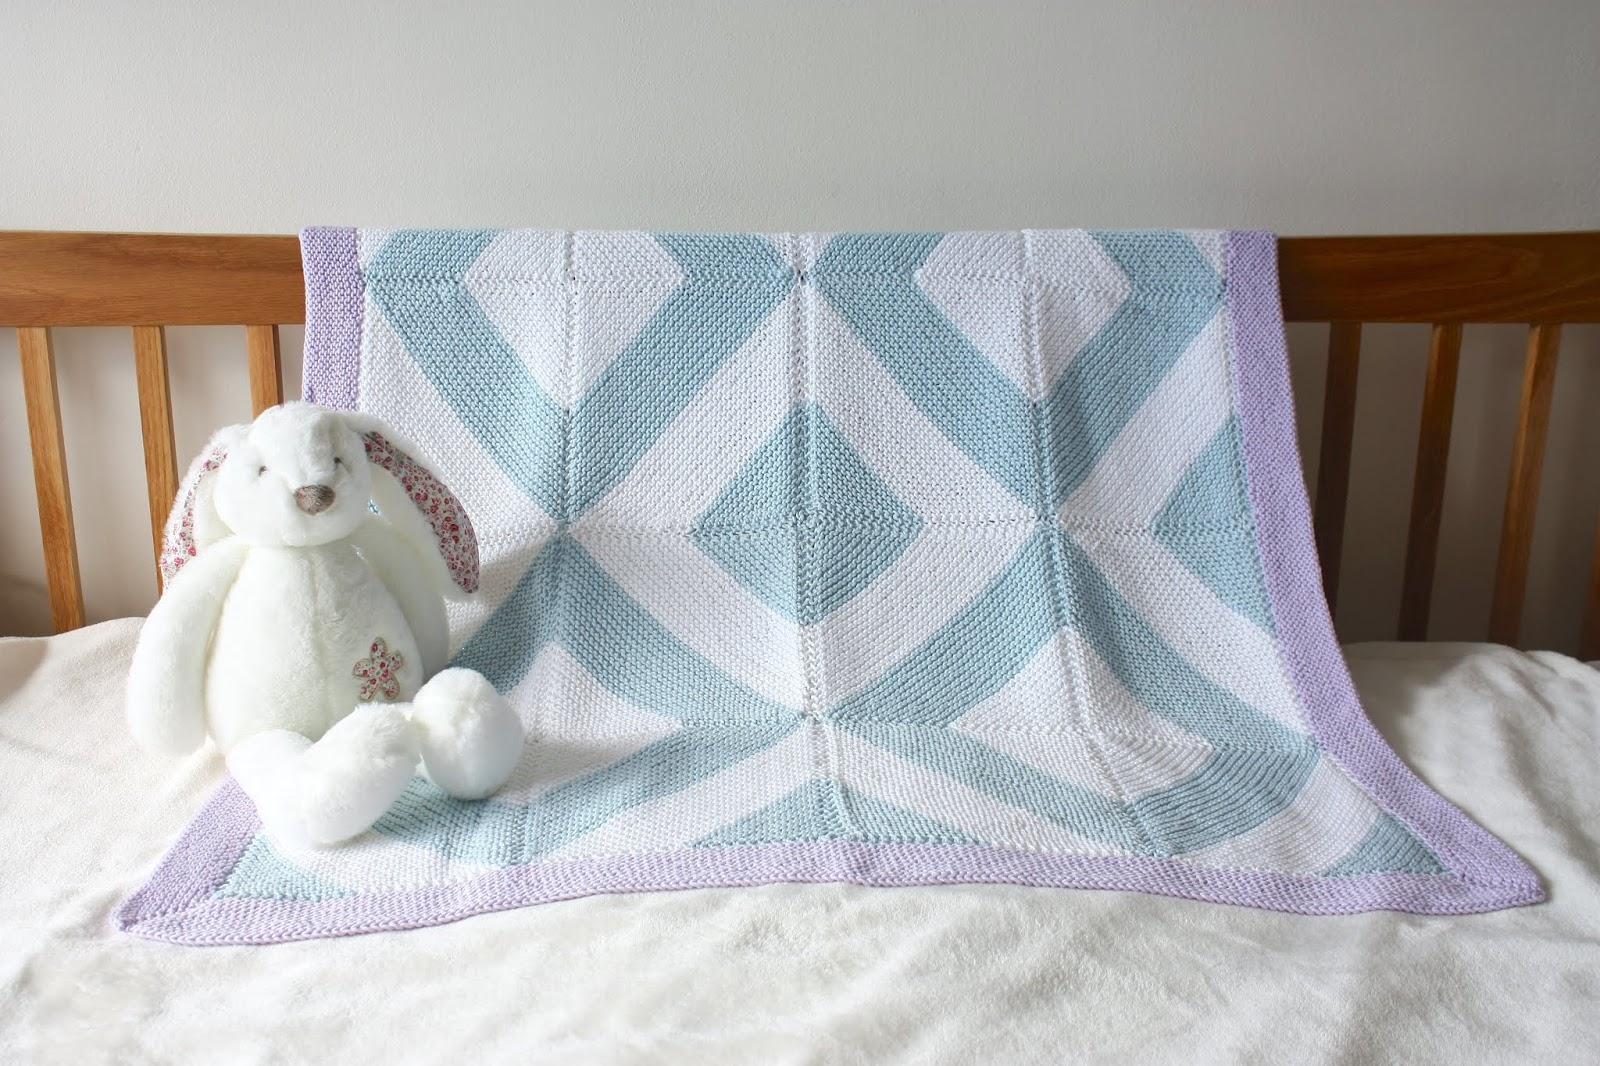 Vikki Bird Designs: Tessellate baby blanket: now available